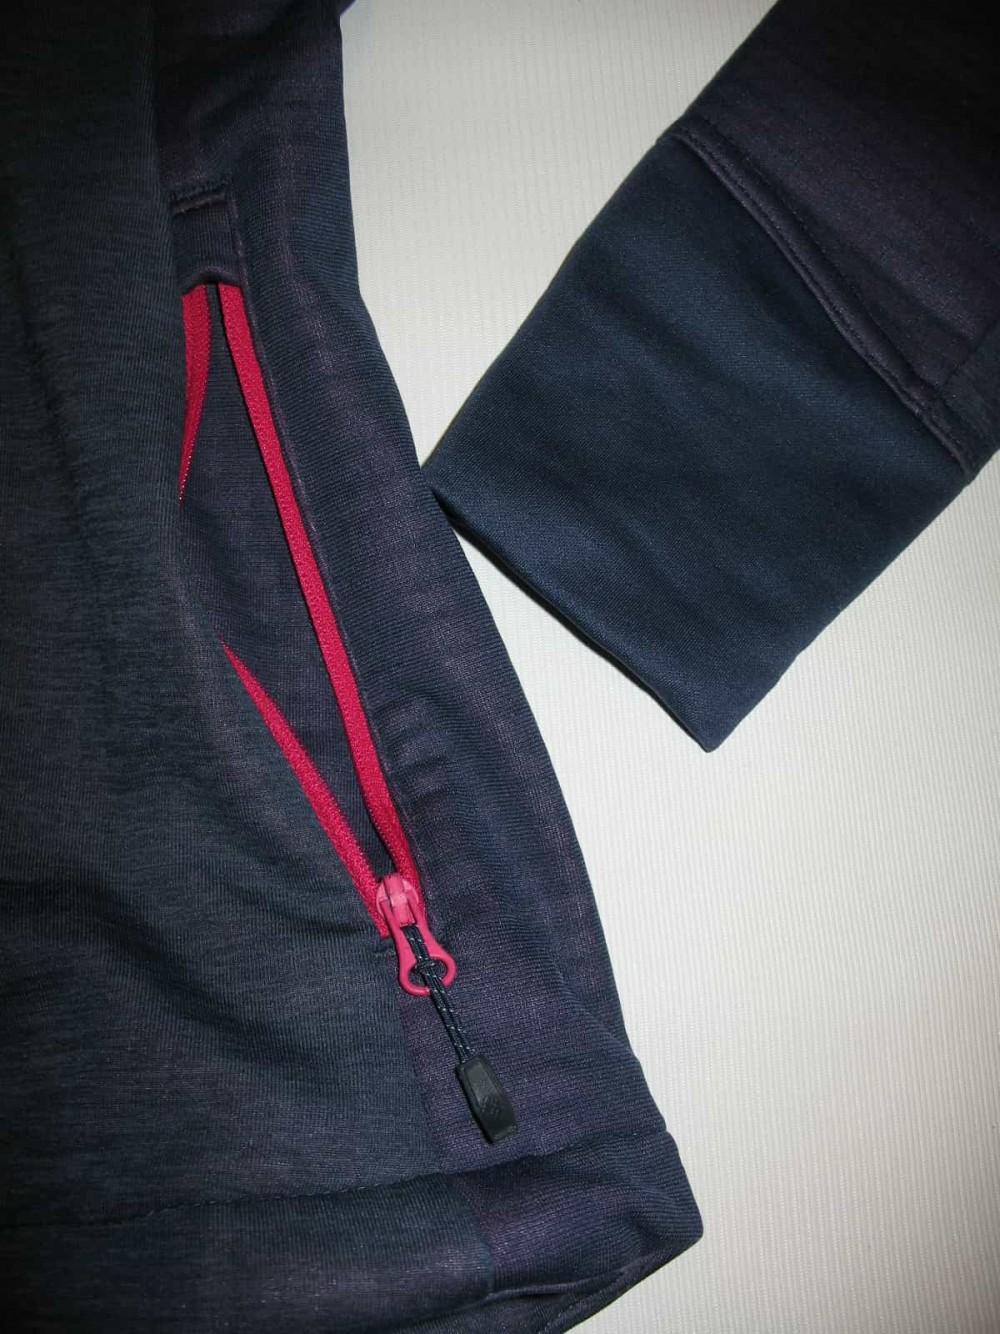 Куртка COLUMBIA steel cliff hooded softshell jacket lady (размер S) - 10